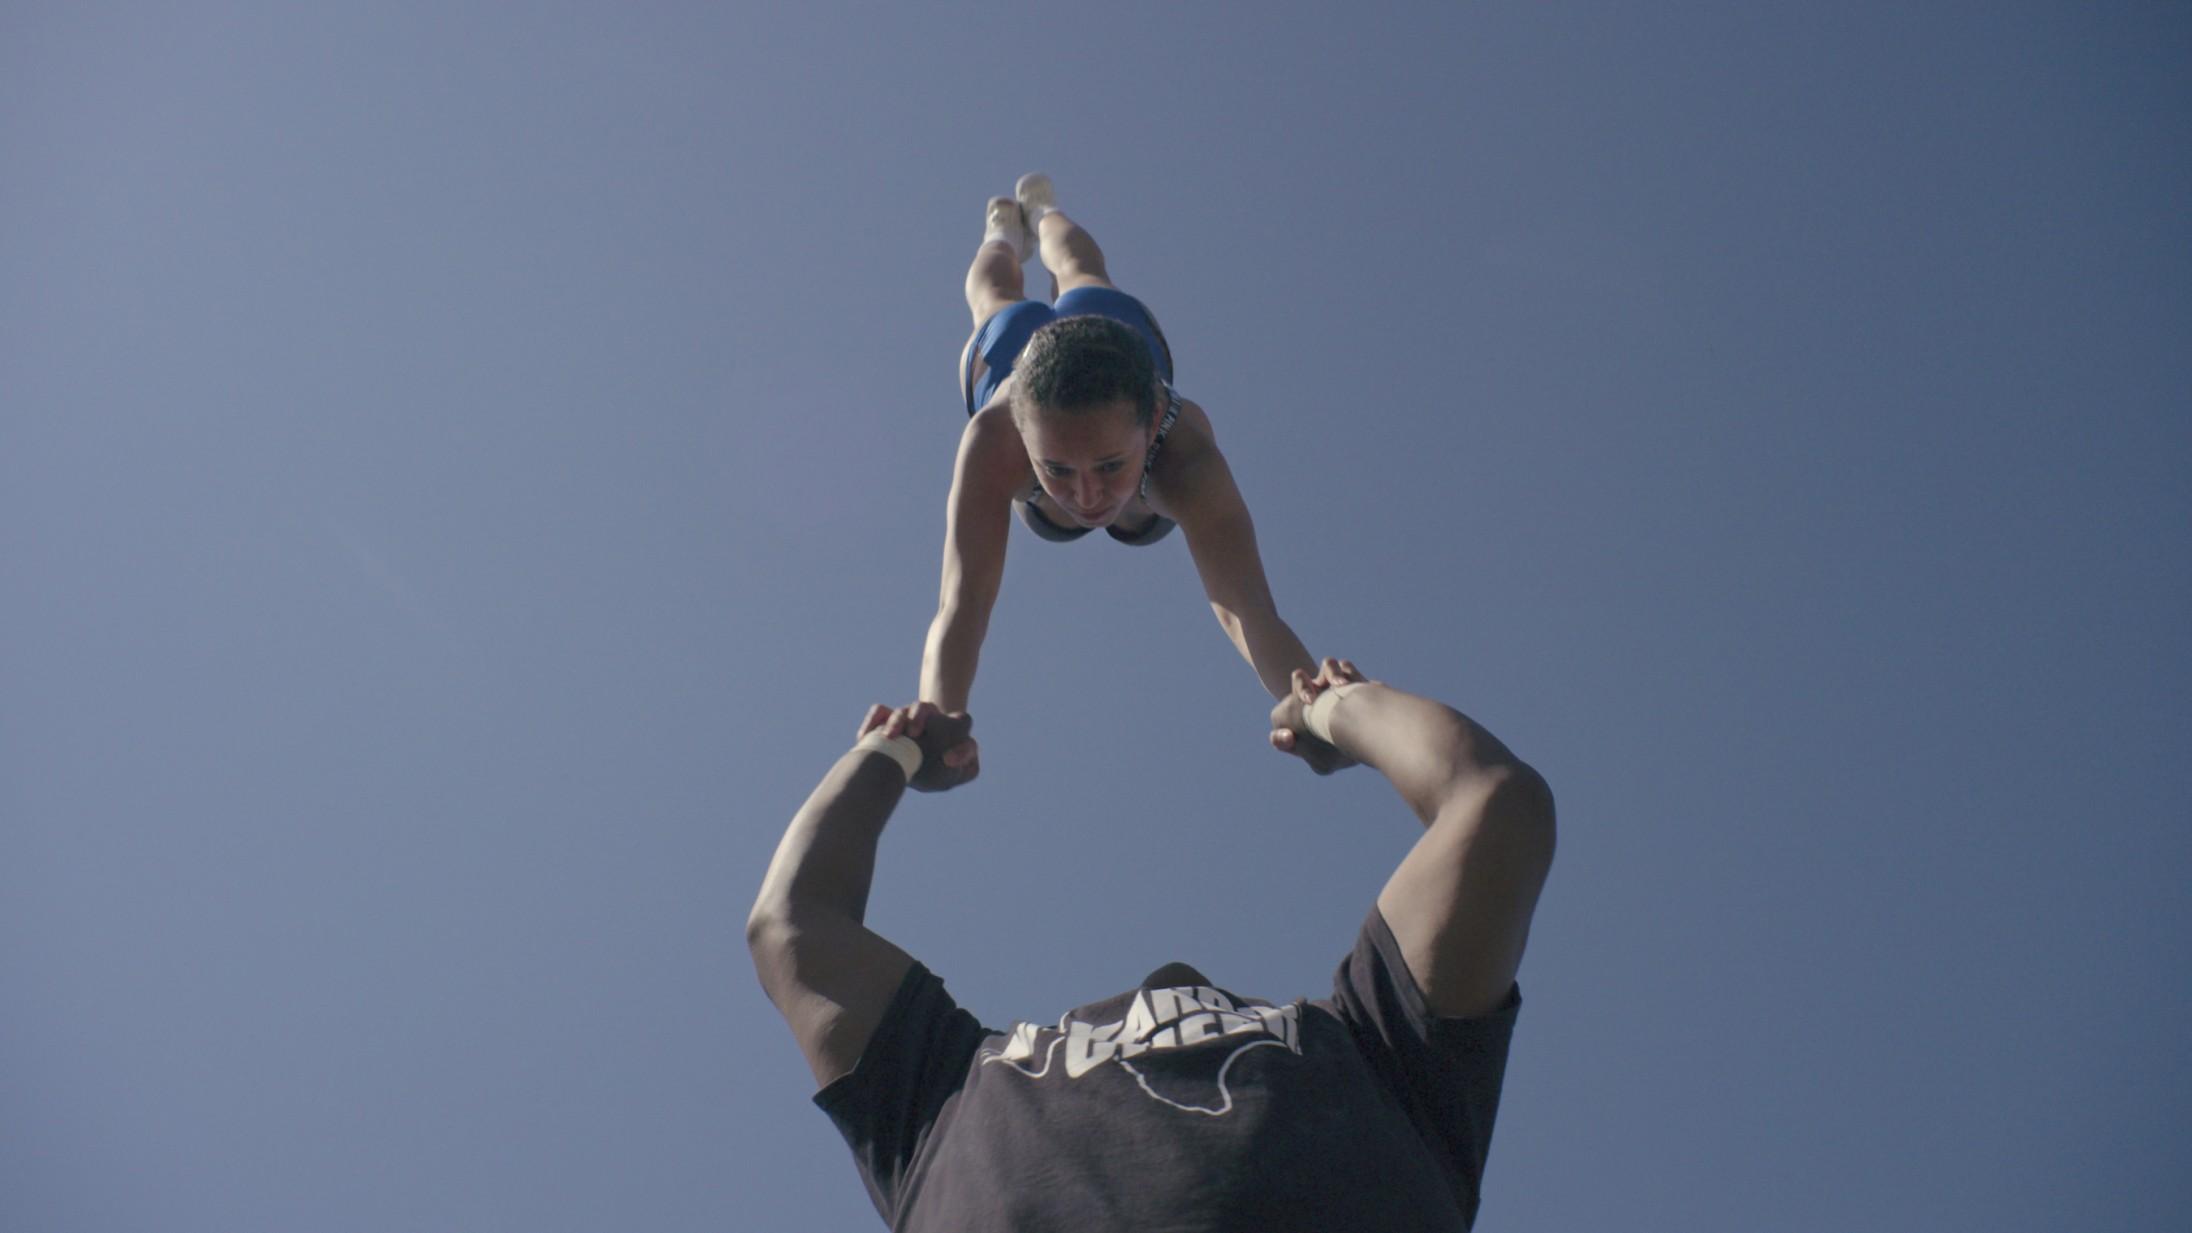 'Cheer': Cheerleading er neglebidende spændende i ny Netflix-serie – men hvor er den kritiske vinkel?